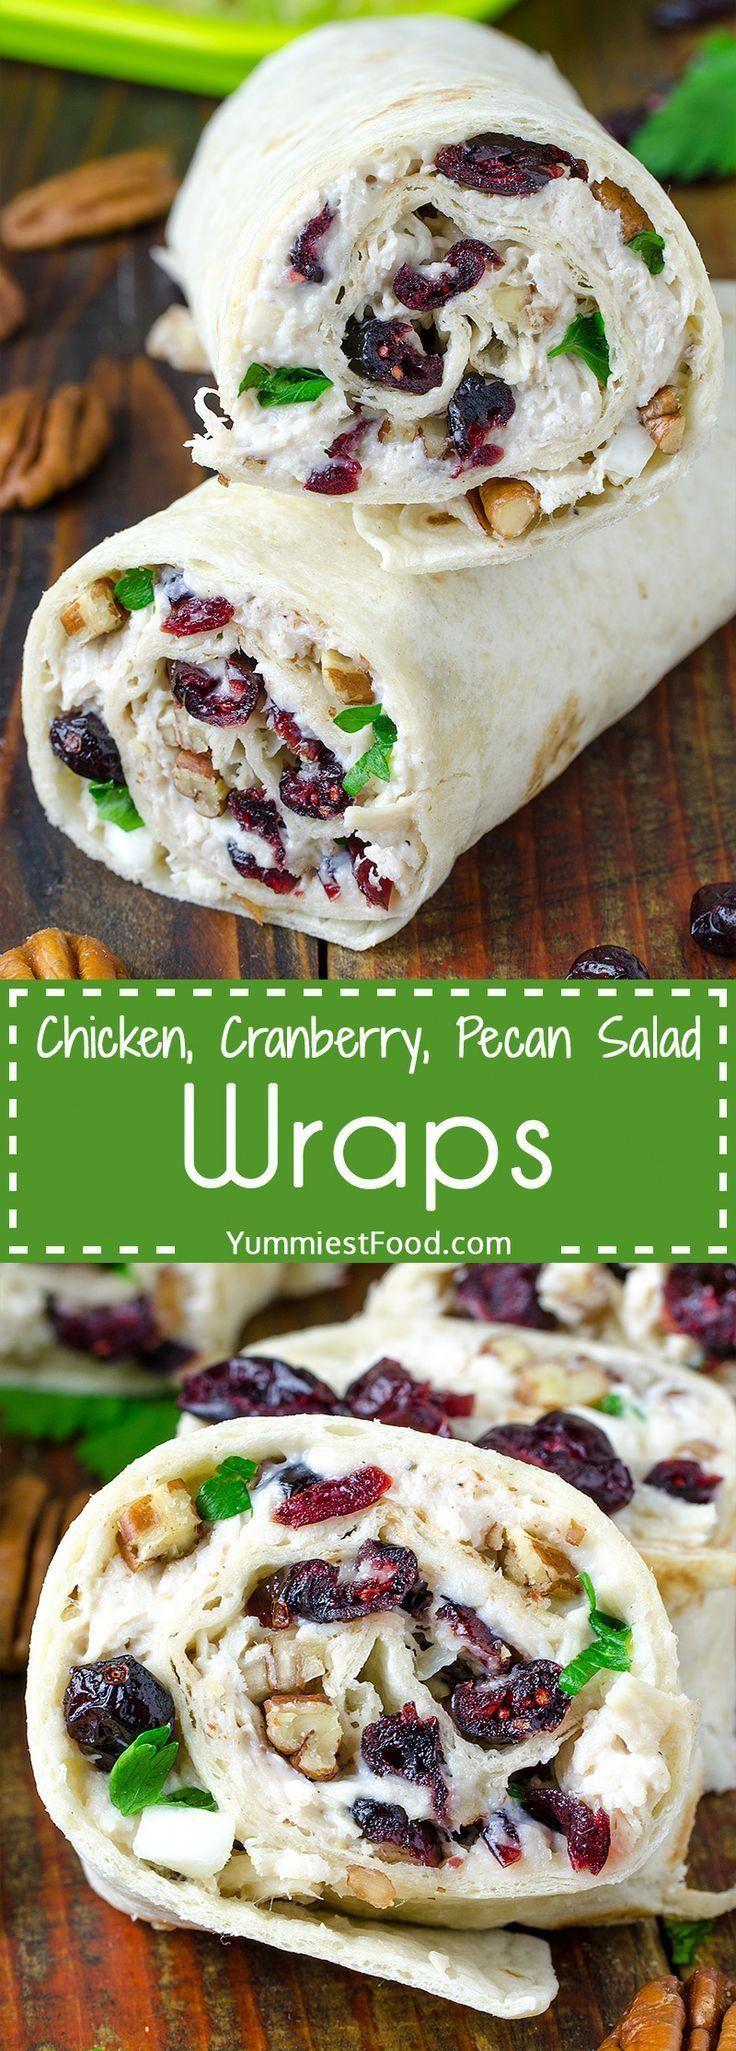 Hühnchen, Cranberry, Pekannuss Salat Wraps   – Salad wraps